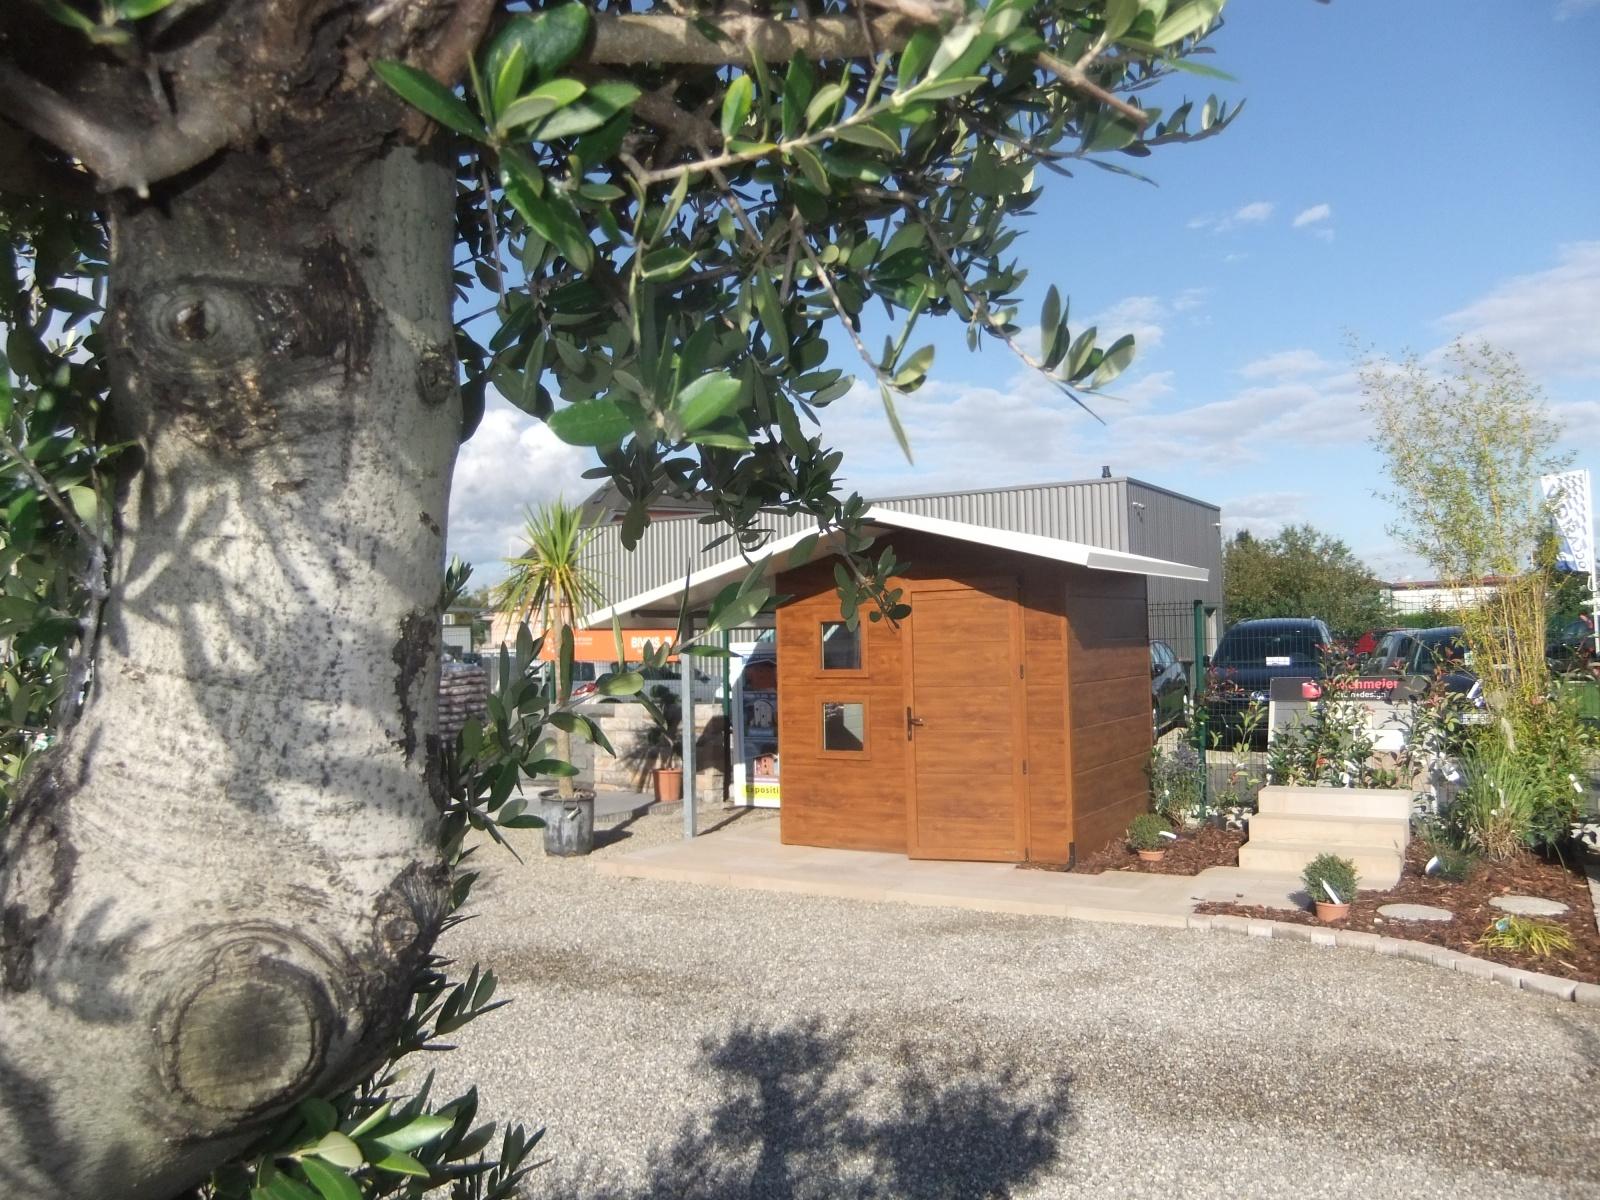 Nouvelle un pavillon de jardin trendel roeschwoog for Jardin haguenau